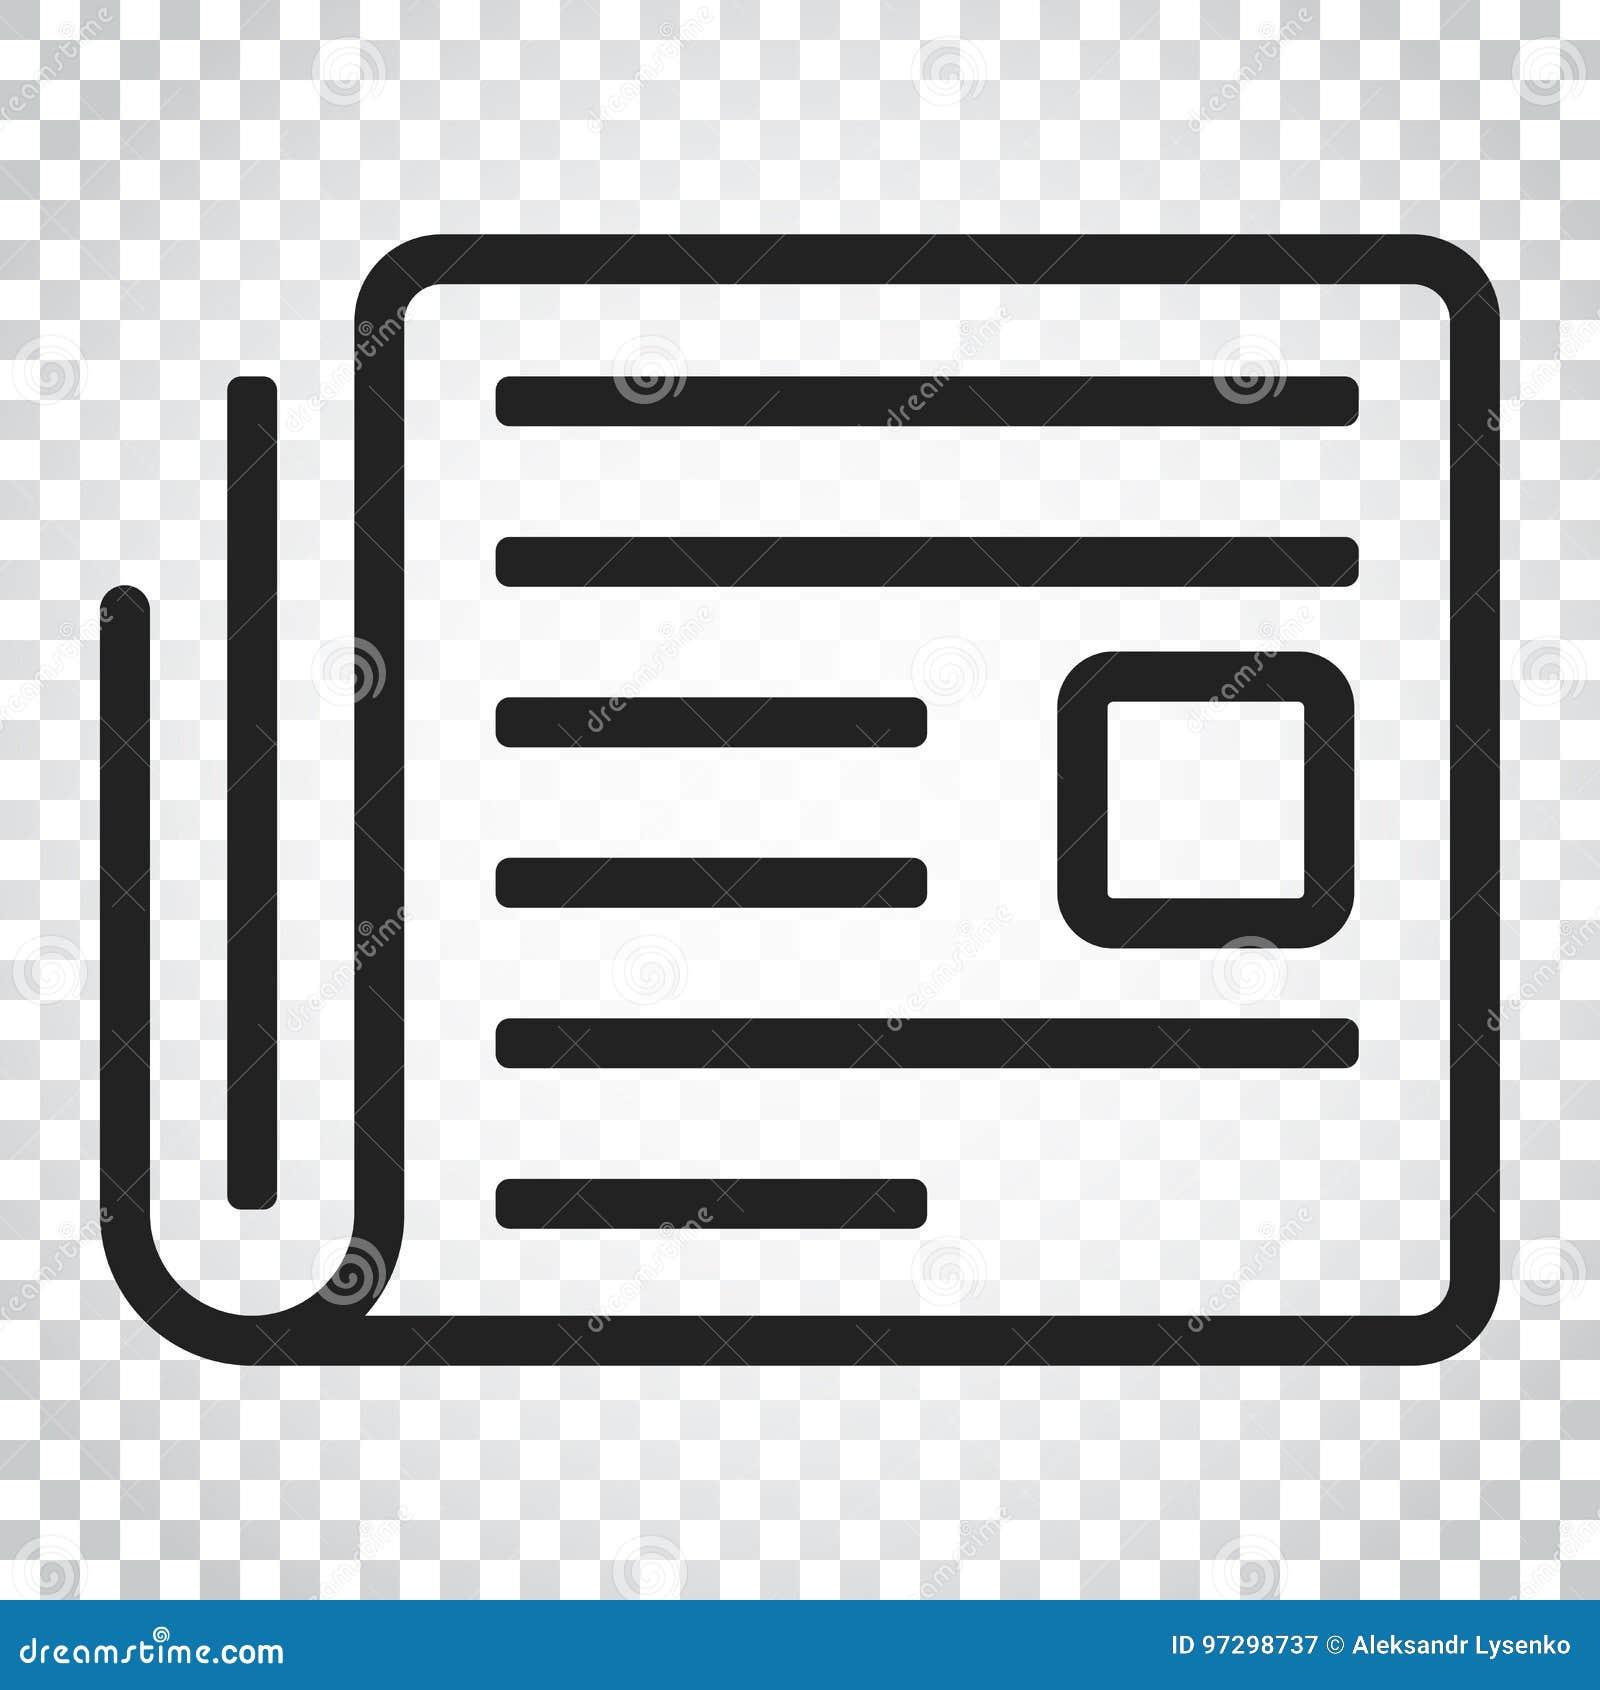 newspaper flat vector icon. news symbol logo illustration. busin